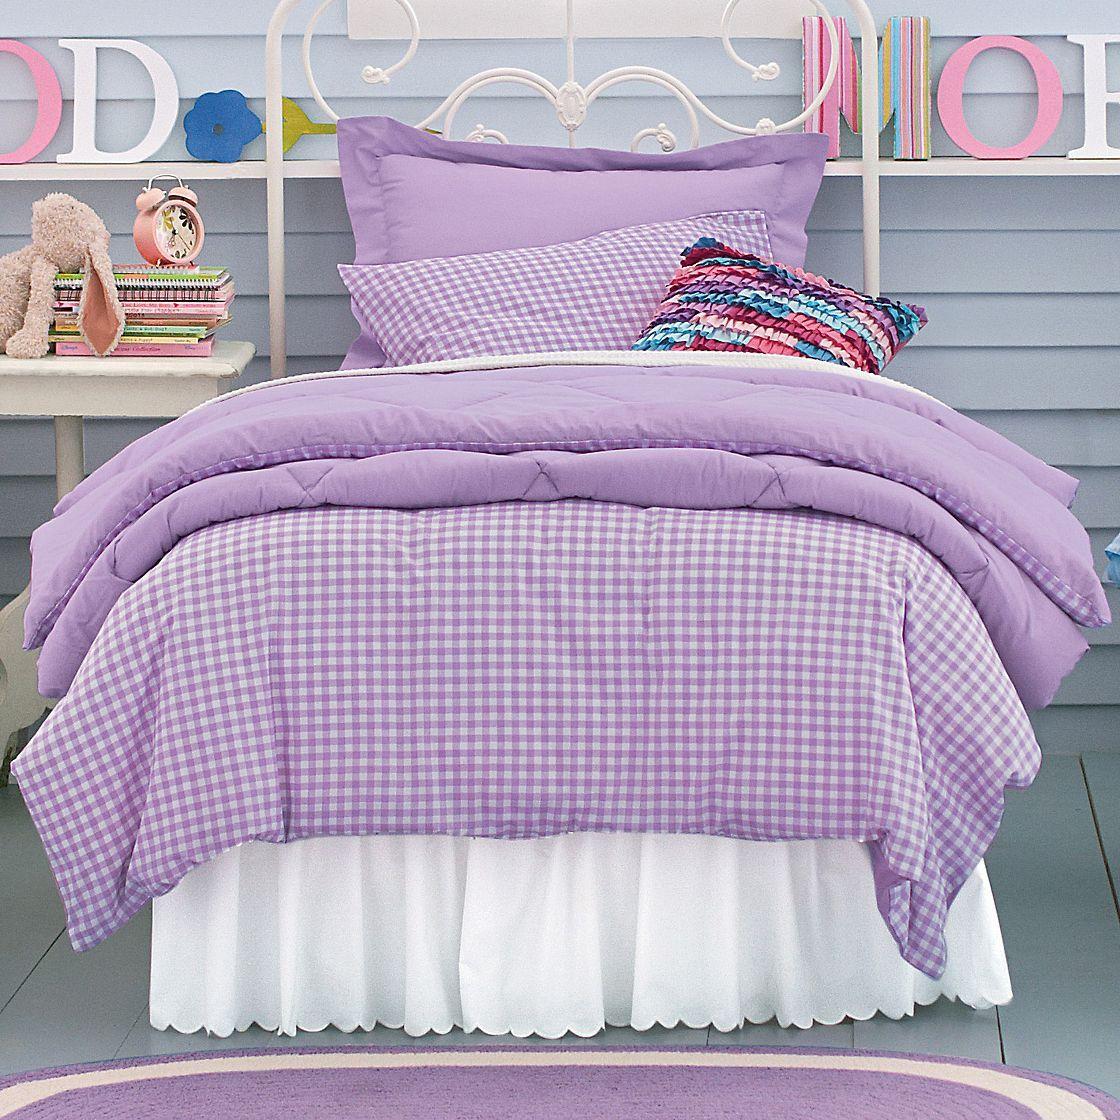 Girls purple bedding - Company Kids Purple Gingham Bedding My Pinkalicious Girl Is Turning Purplicious What